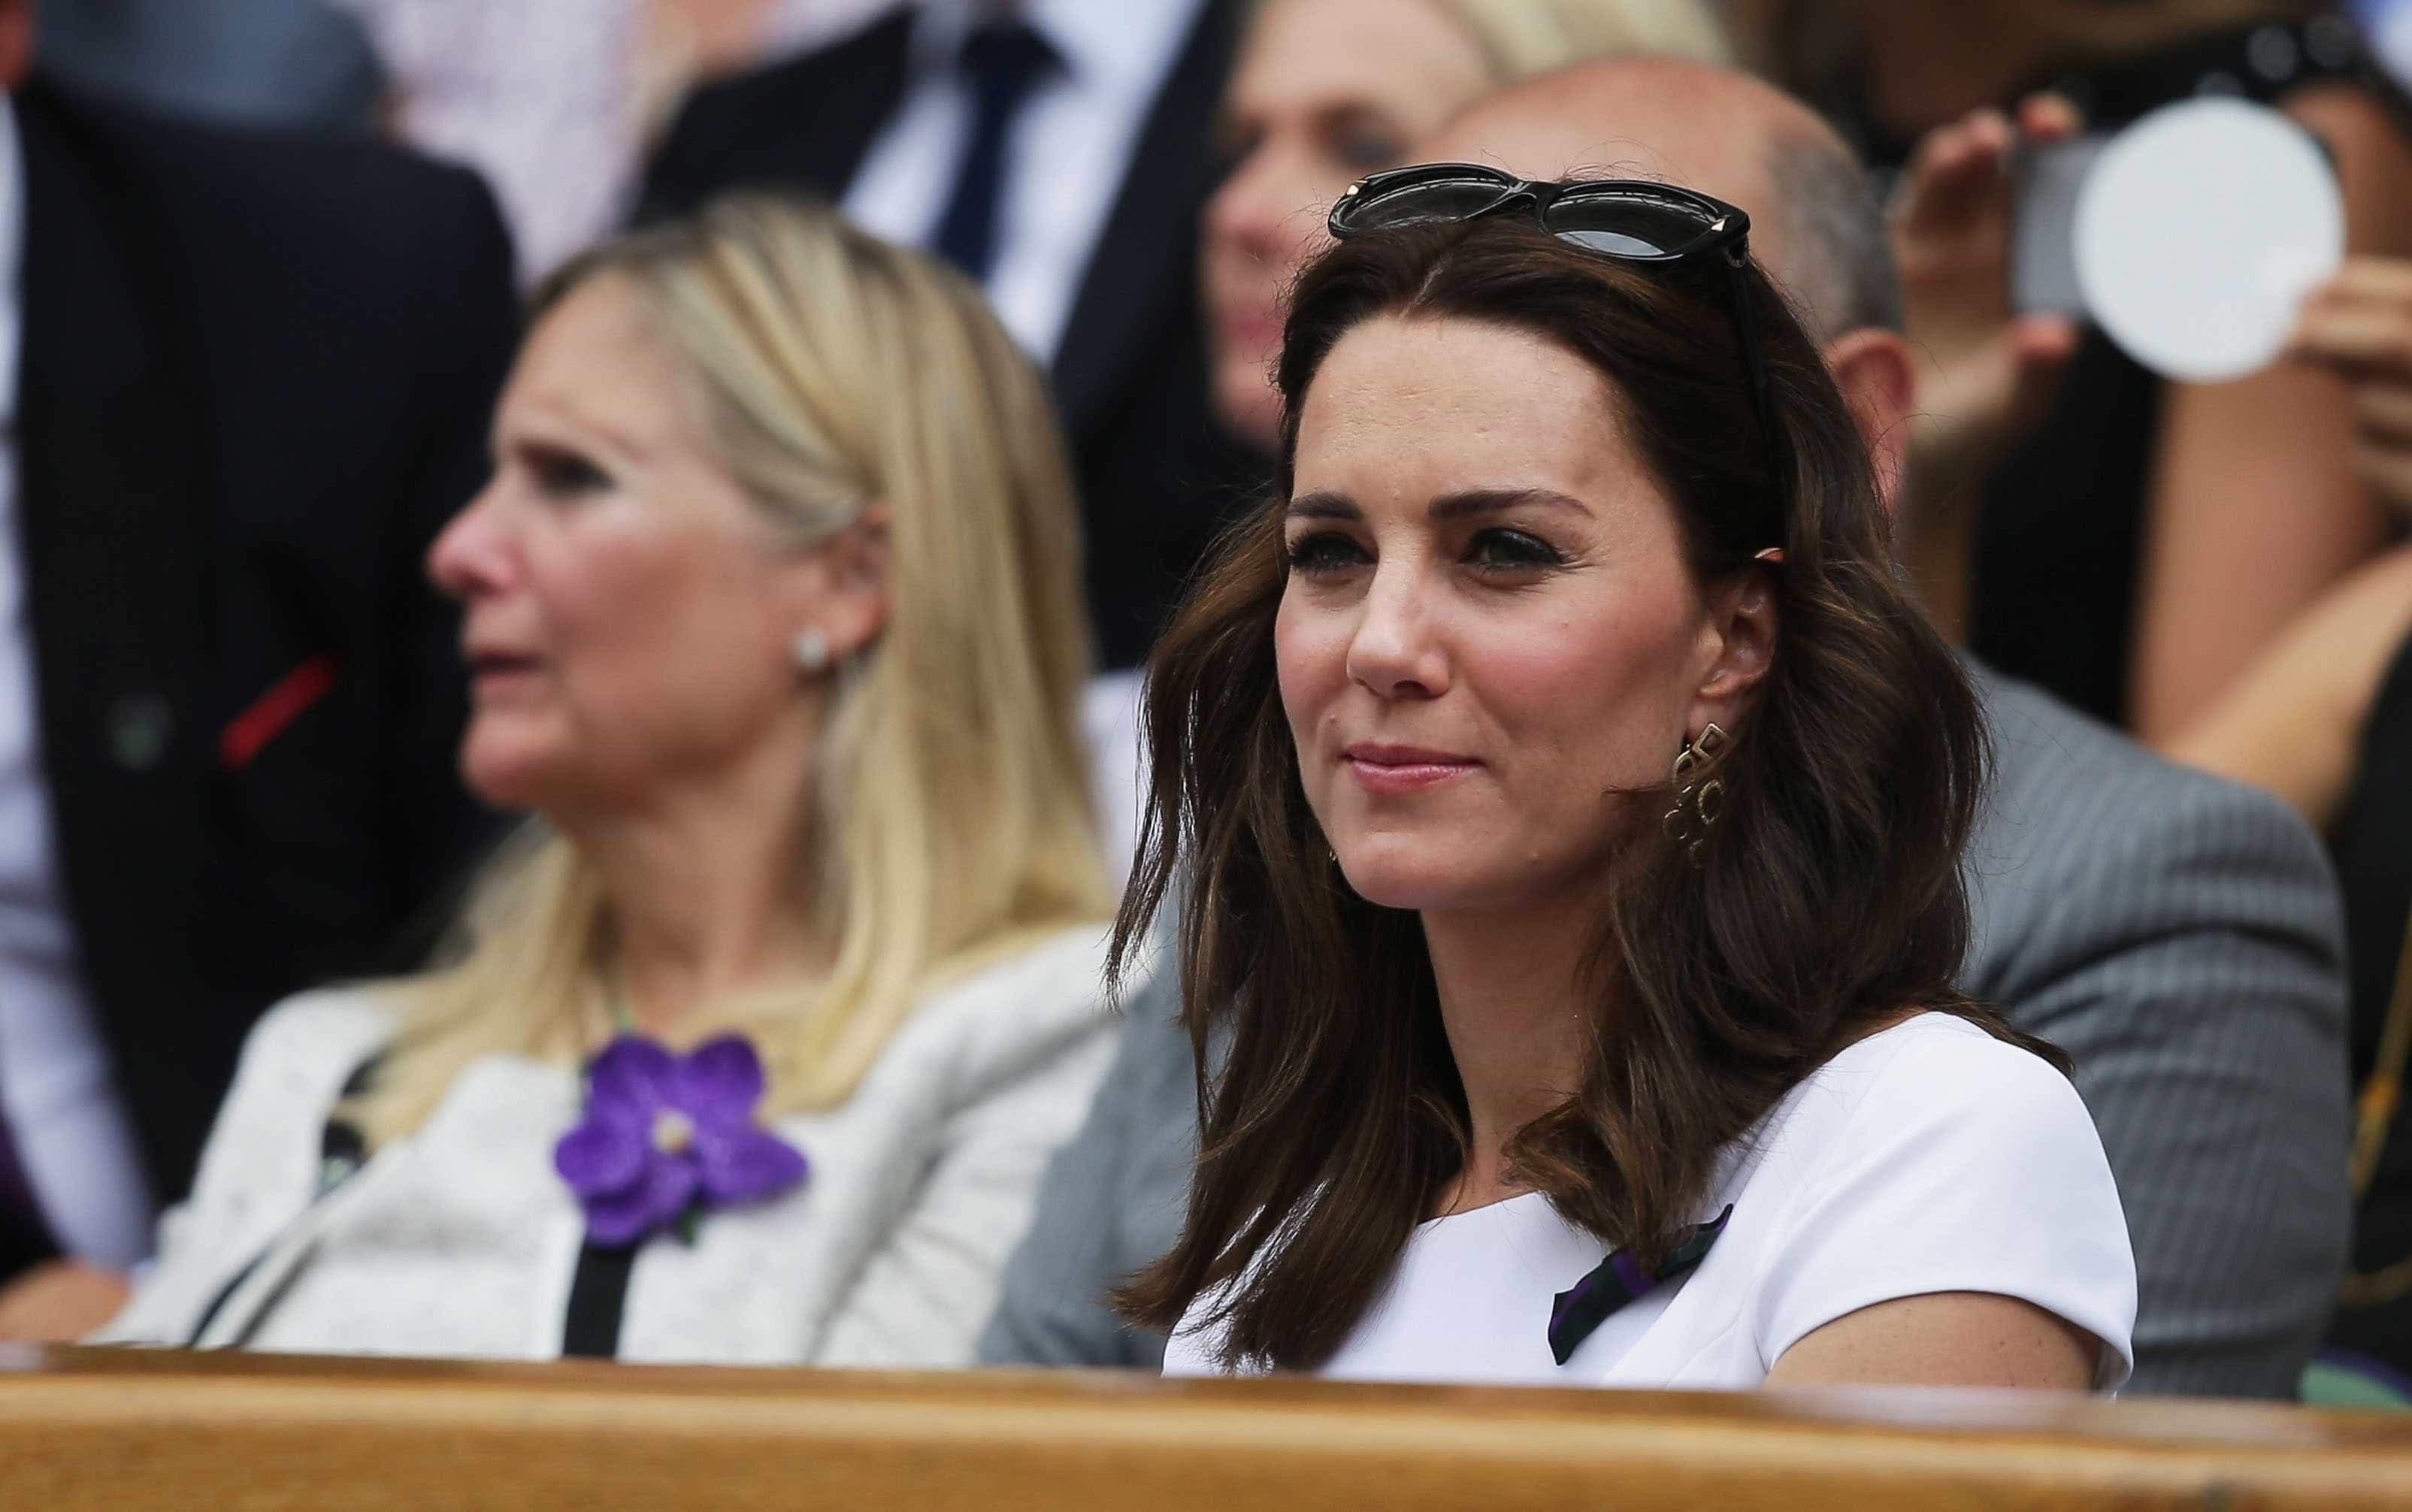 Kate Middleton arrasa com look simples mas elegante na final de Wimbled